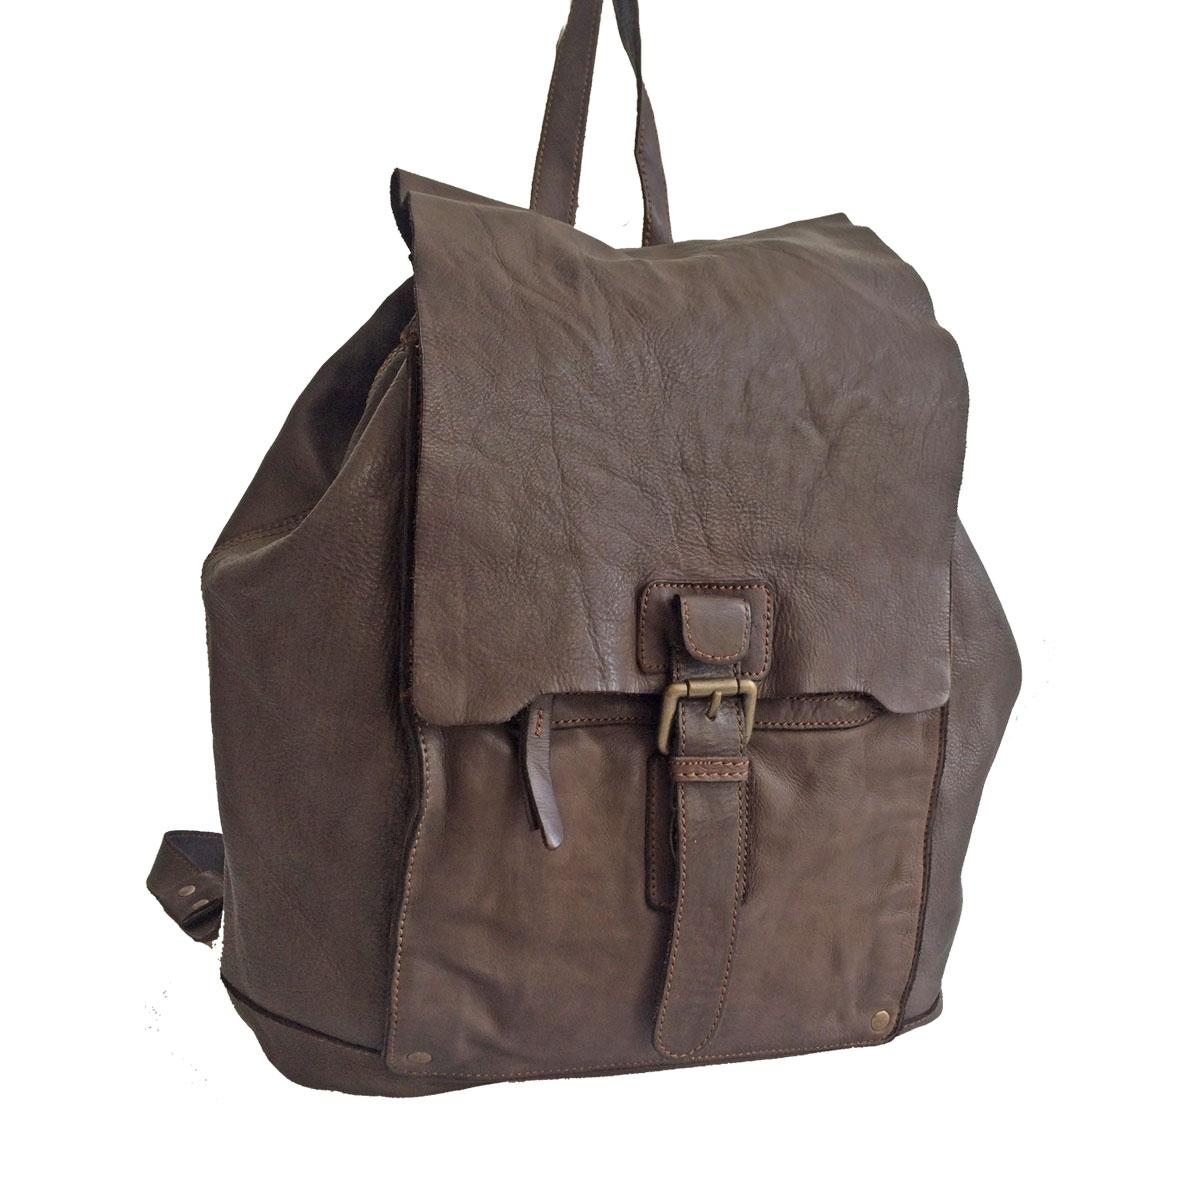 Grand Bag Sac Harolds Dos 0259204 Vintage Cuir À BWeCrdox